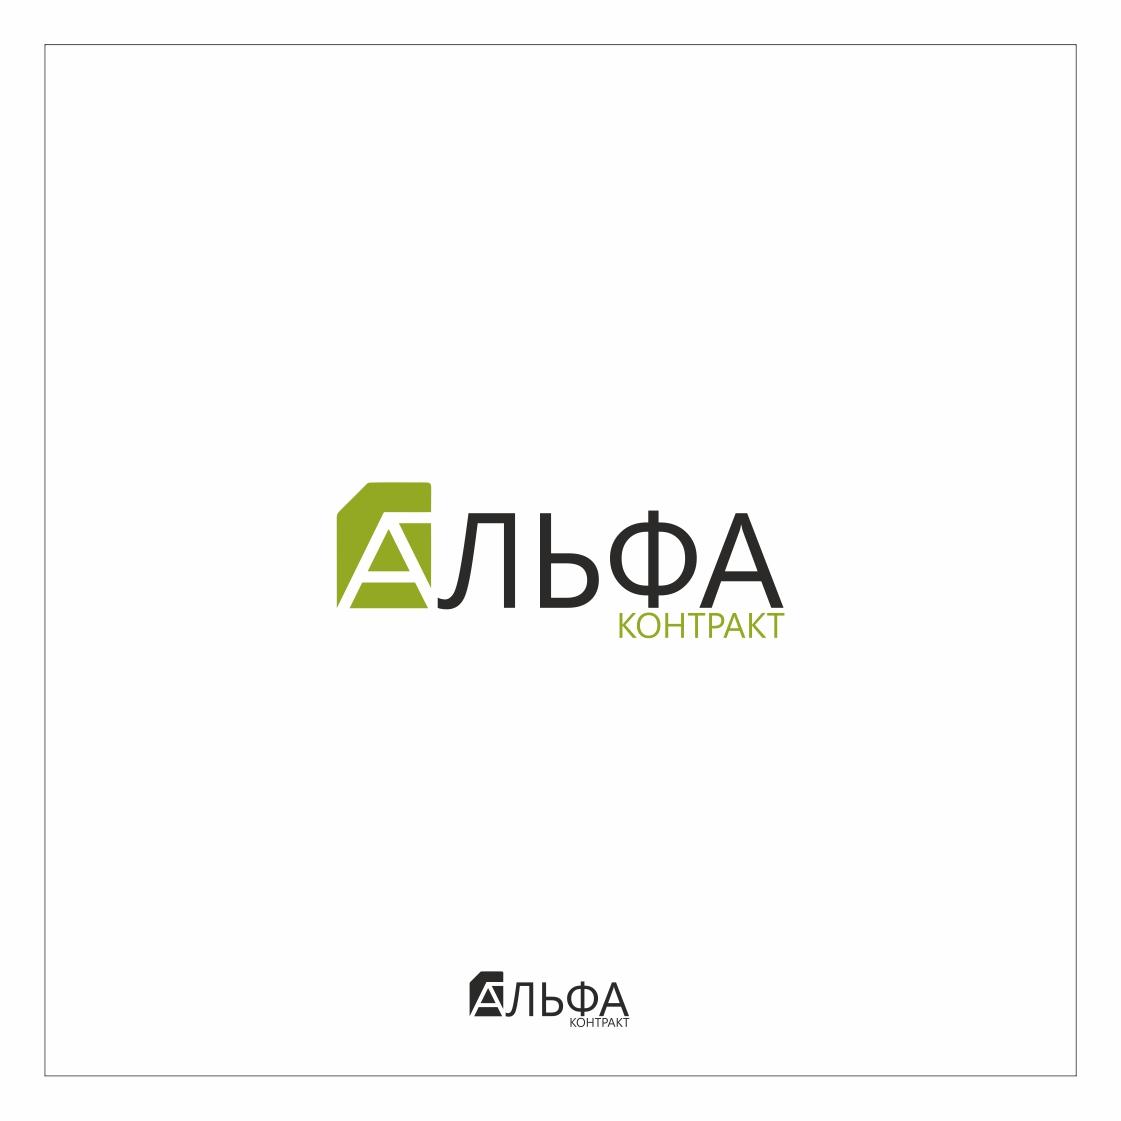 Дизайнер для разработки логотипа компании фото f_7455bf71e8319124.jpg